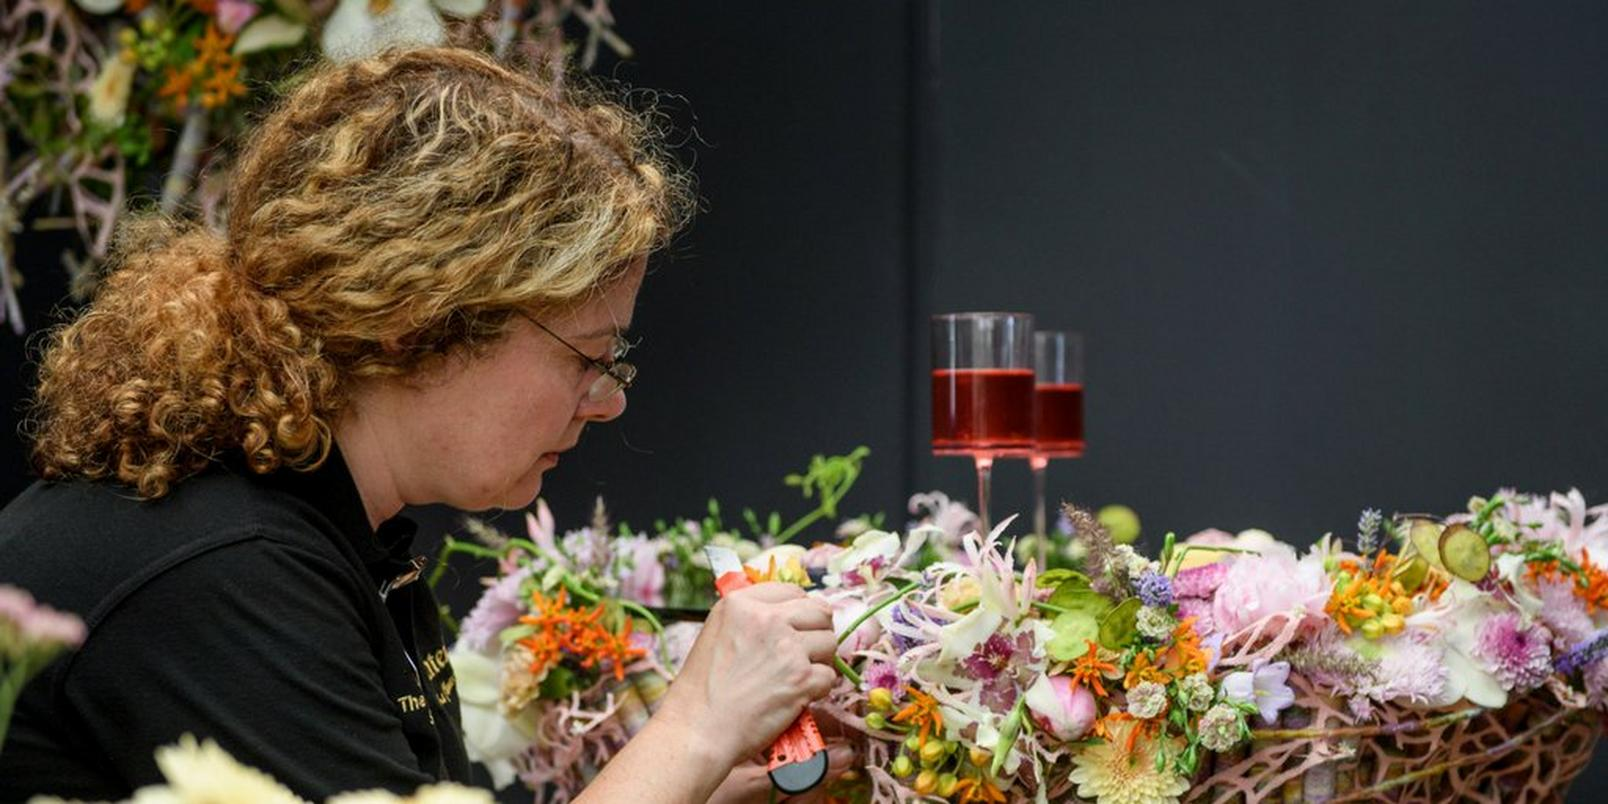 Laura-leong-crowned-interflora-florist-year-2018-6